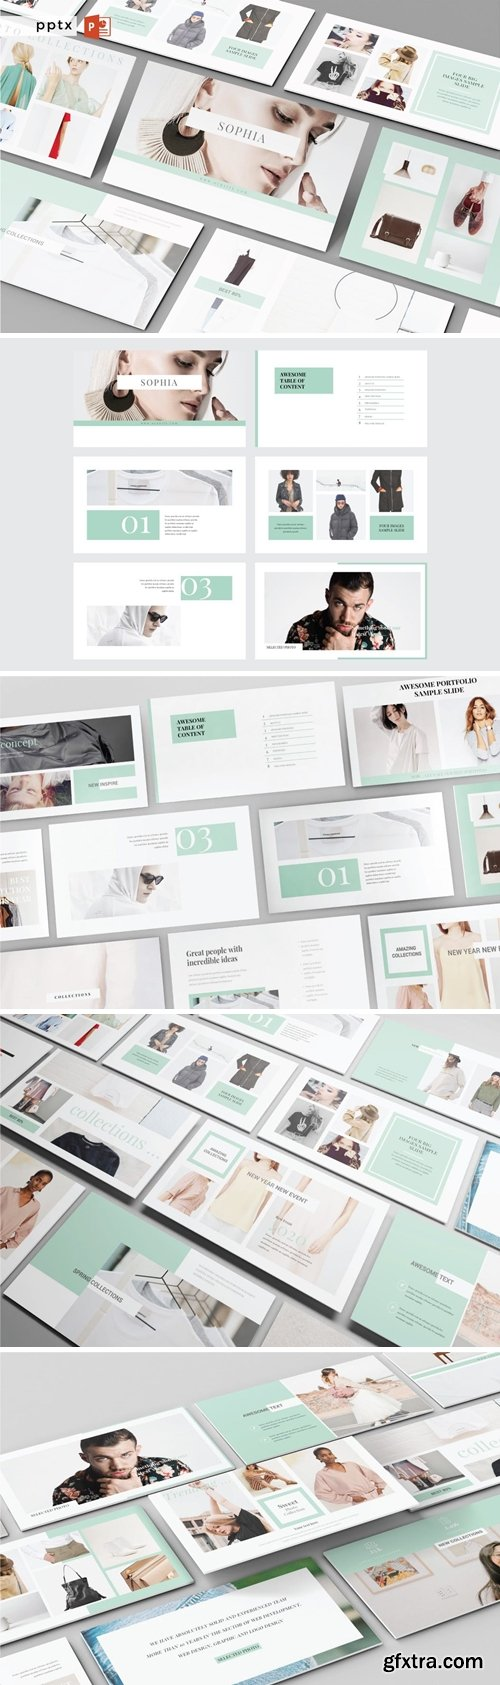 SOPHIA - Multipurpose Powerpoint, Google Slides and Keynote Template Presentation